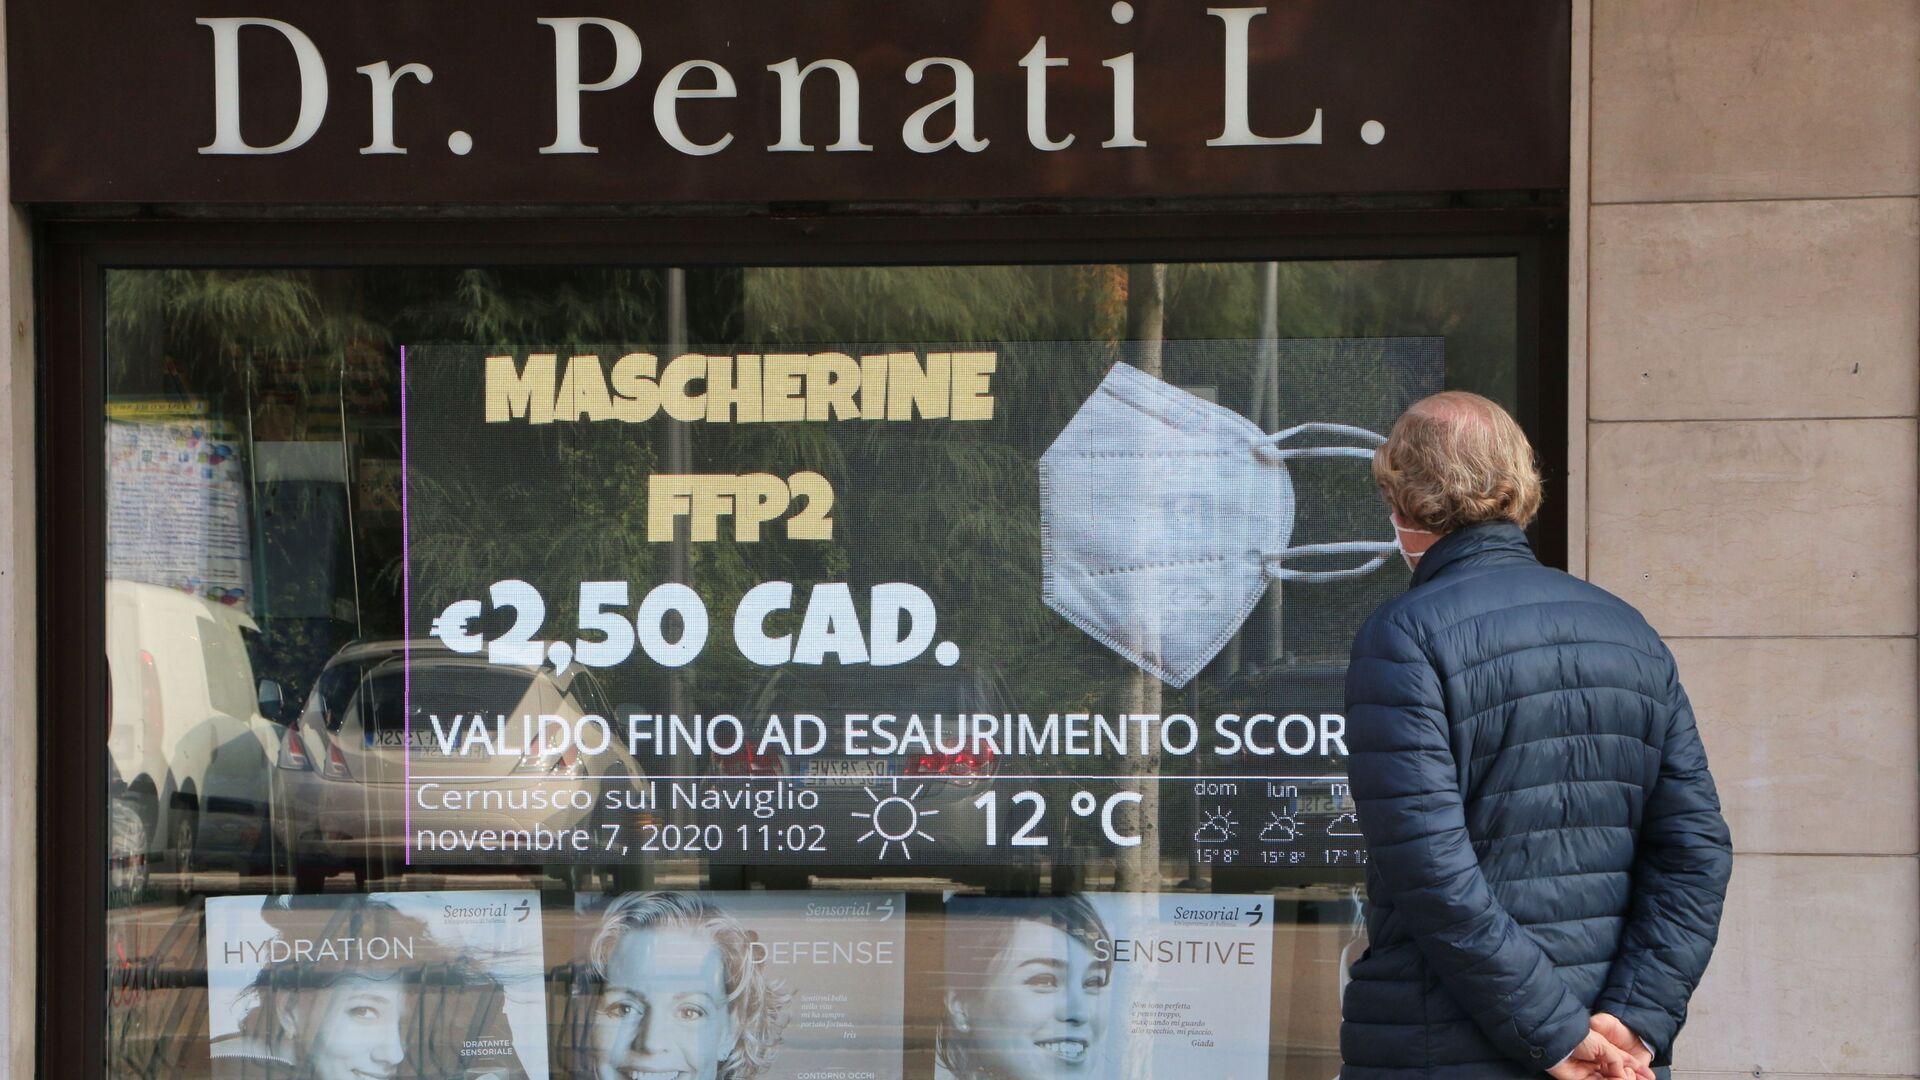 Mascherine in vendita  - Sputnik Italia, 1920, 03.04.2021